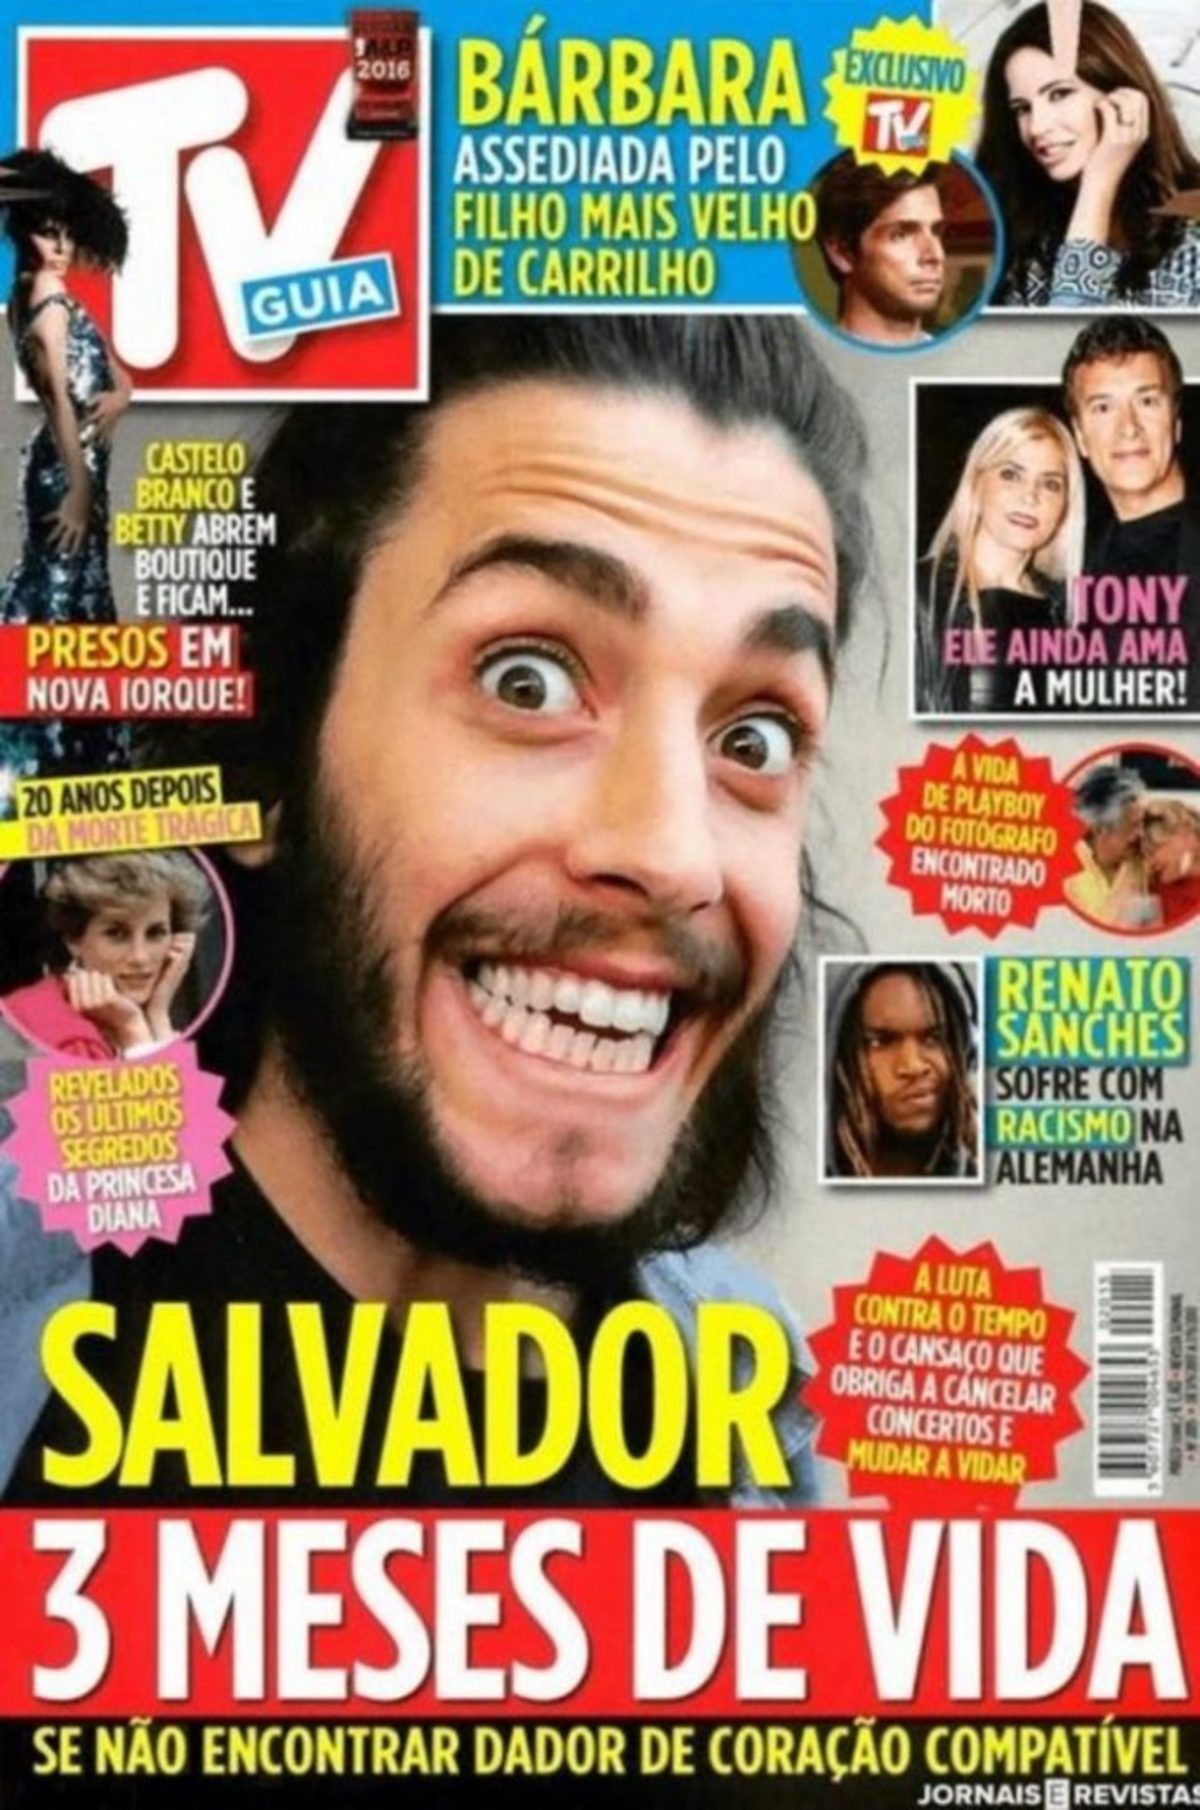 salvador eurovision - Αργοπεθαίνει ο νικητής της Eurovision – Έχει τρεις μήνες ζωής - Σαλβαδορ, Ισπανία